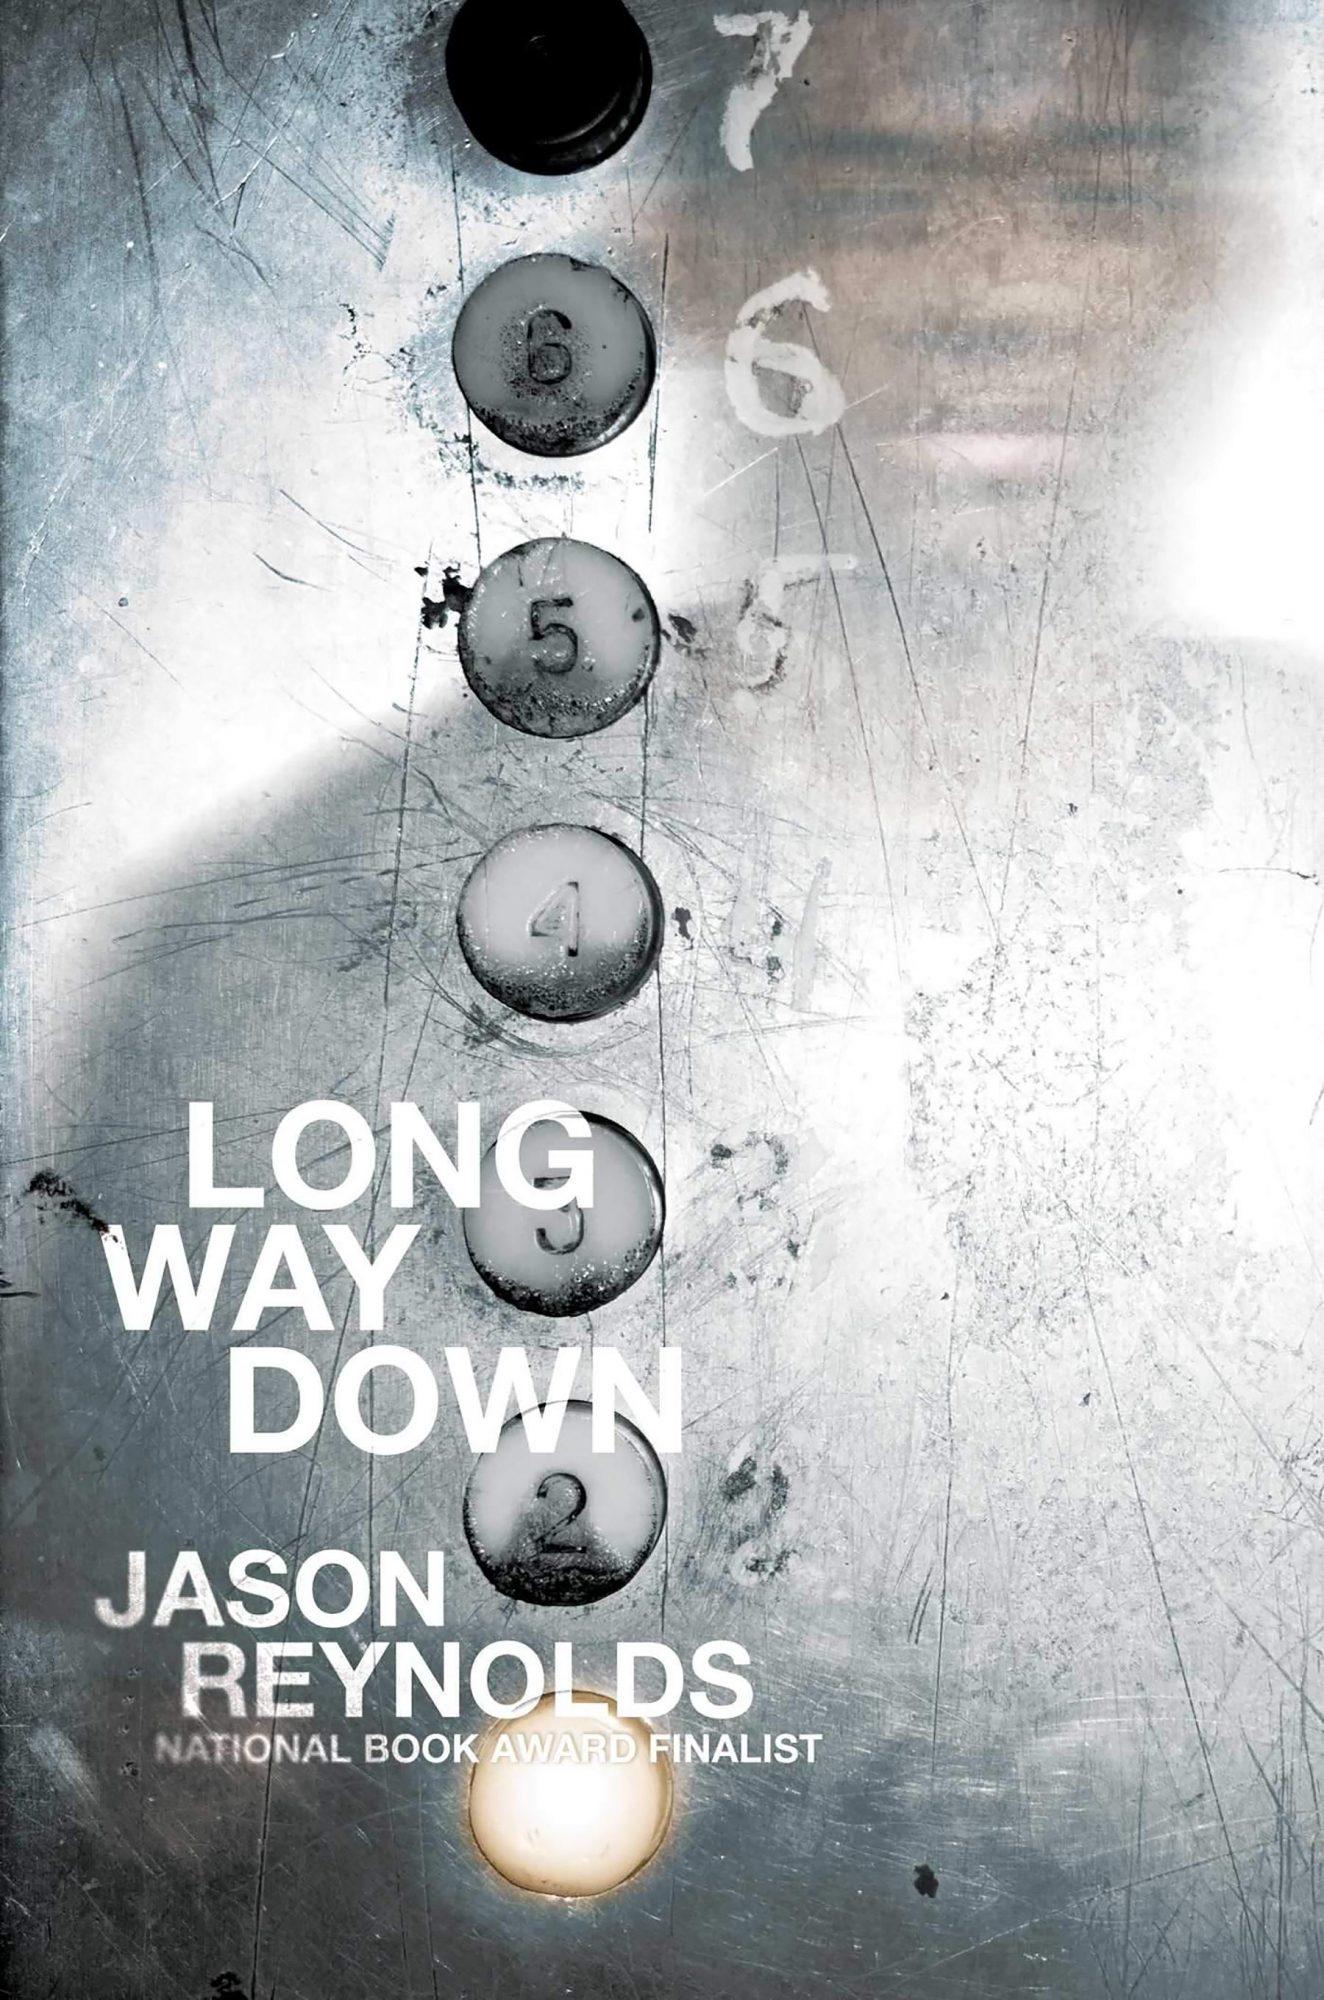 Long Way Down by Jason Reynolds CR: Simon & Schuster